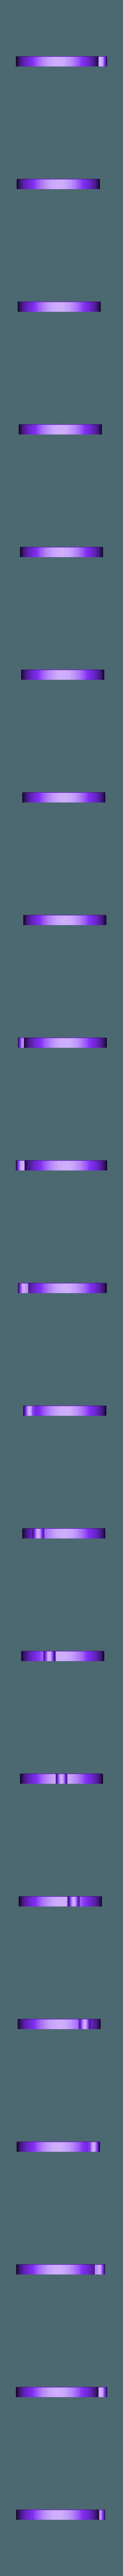 Soliflore-Pièce1-V2.stl Download STL file Stem vase / Vase to be fixed on a glass pot • 3D print object, Jonathan-AtelierVOUS